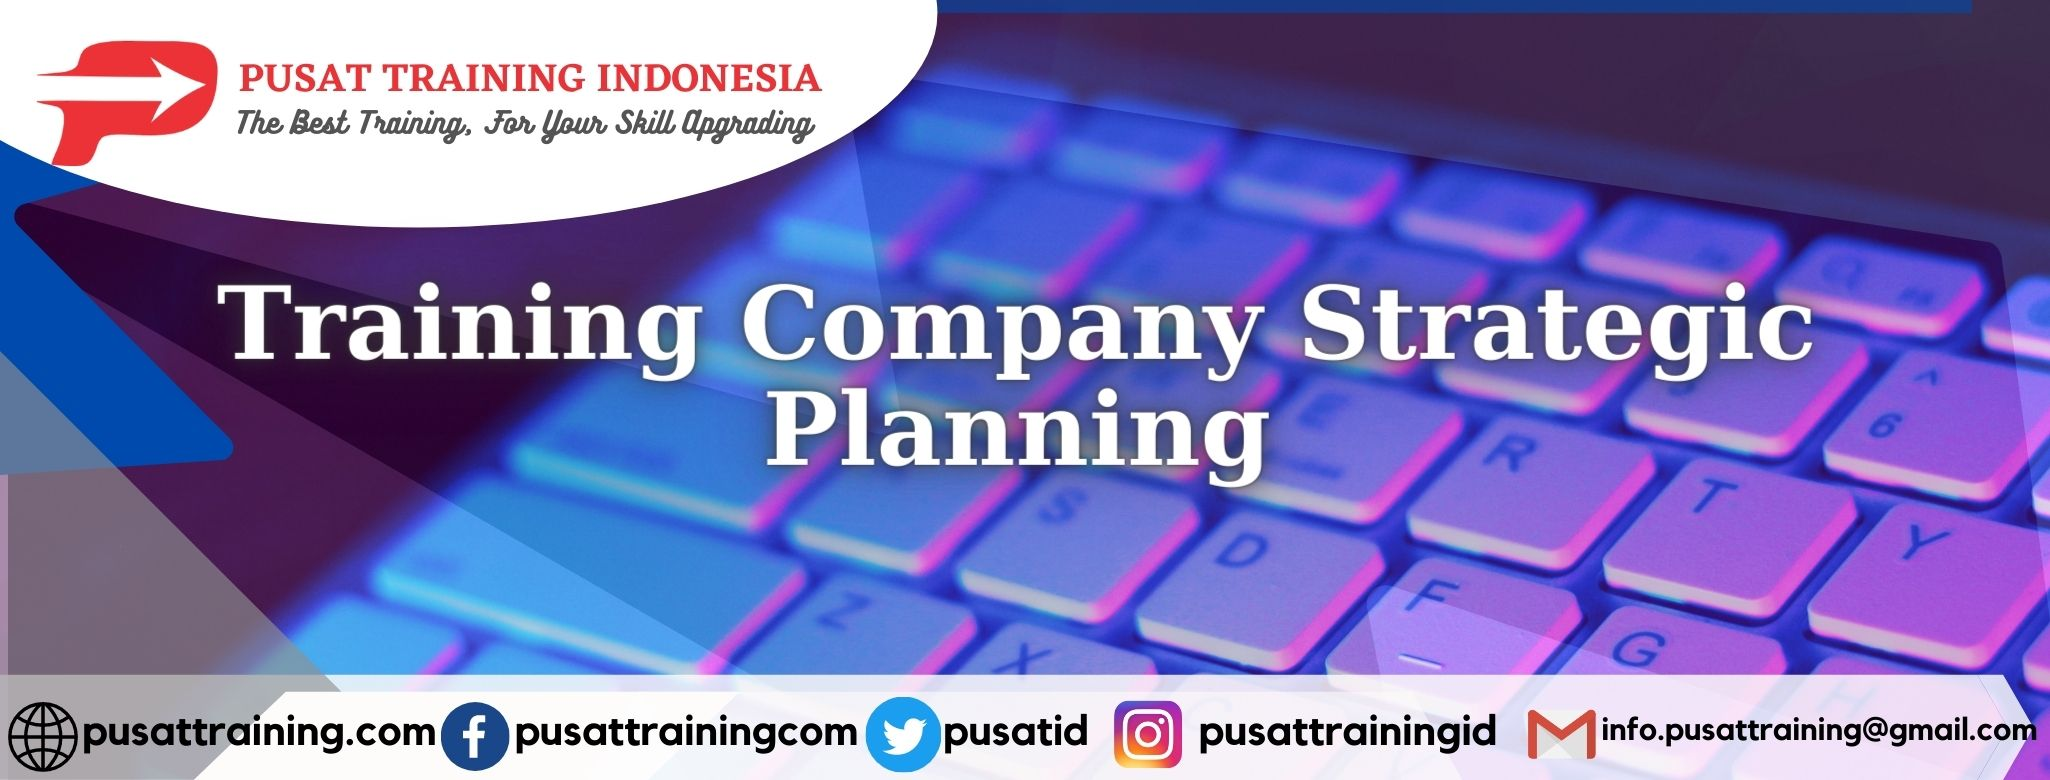 Training-Company-Strategic-Planning